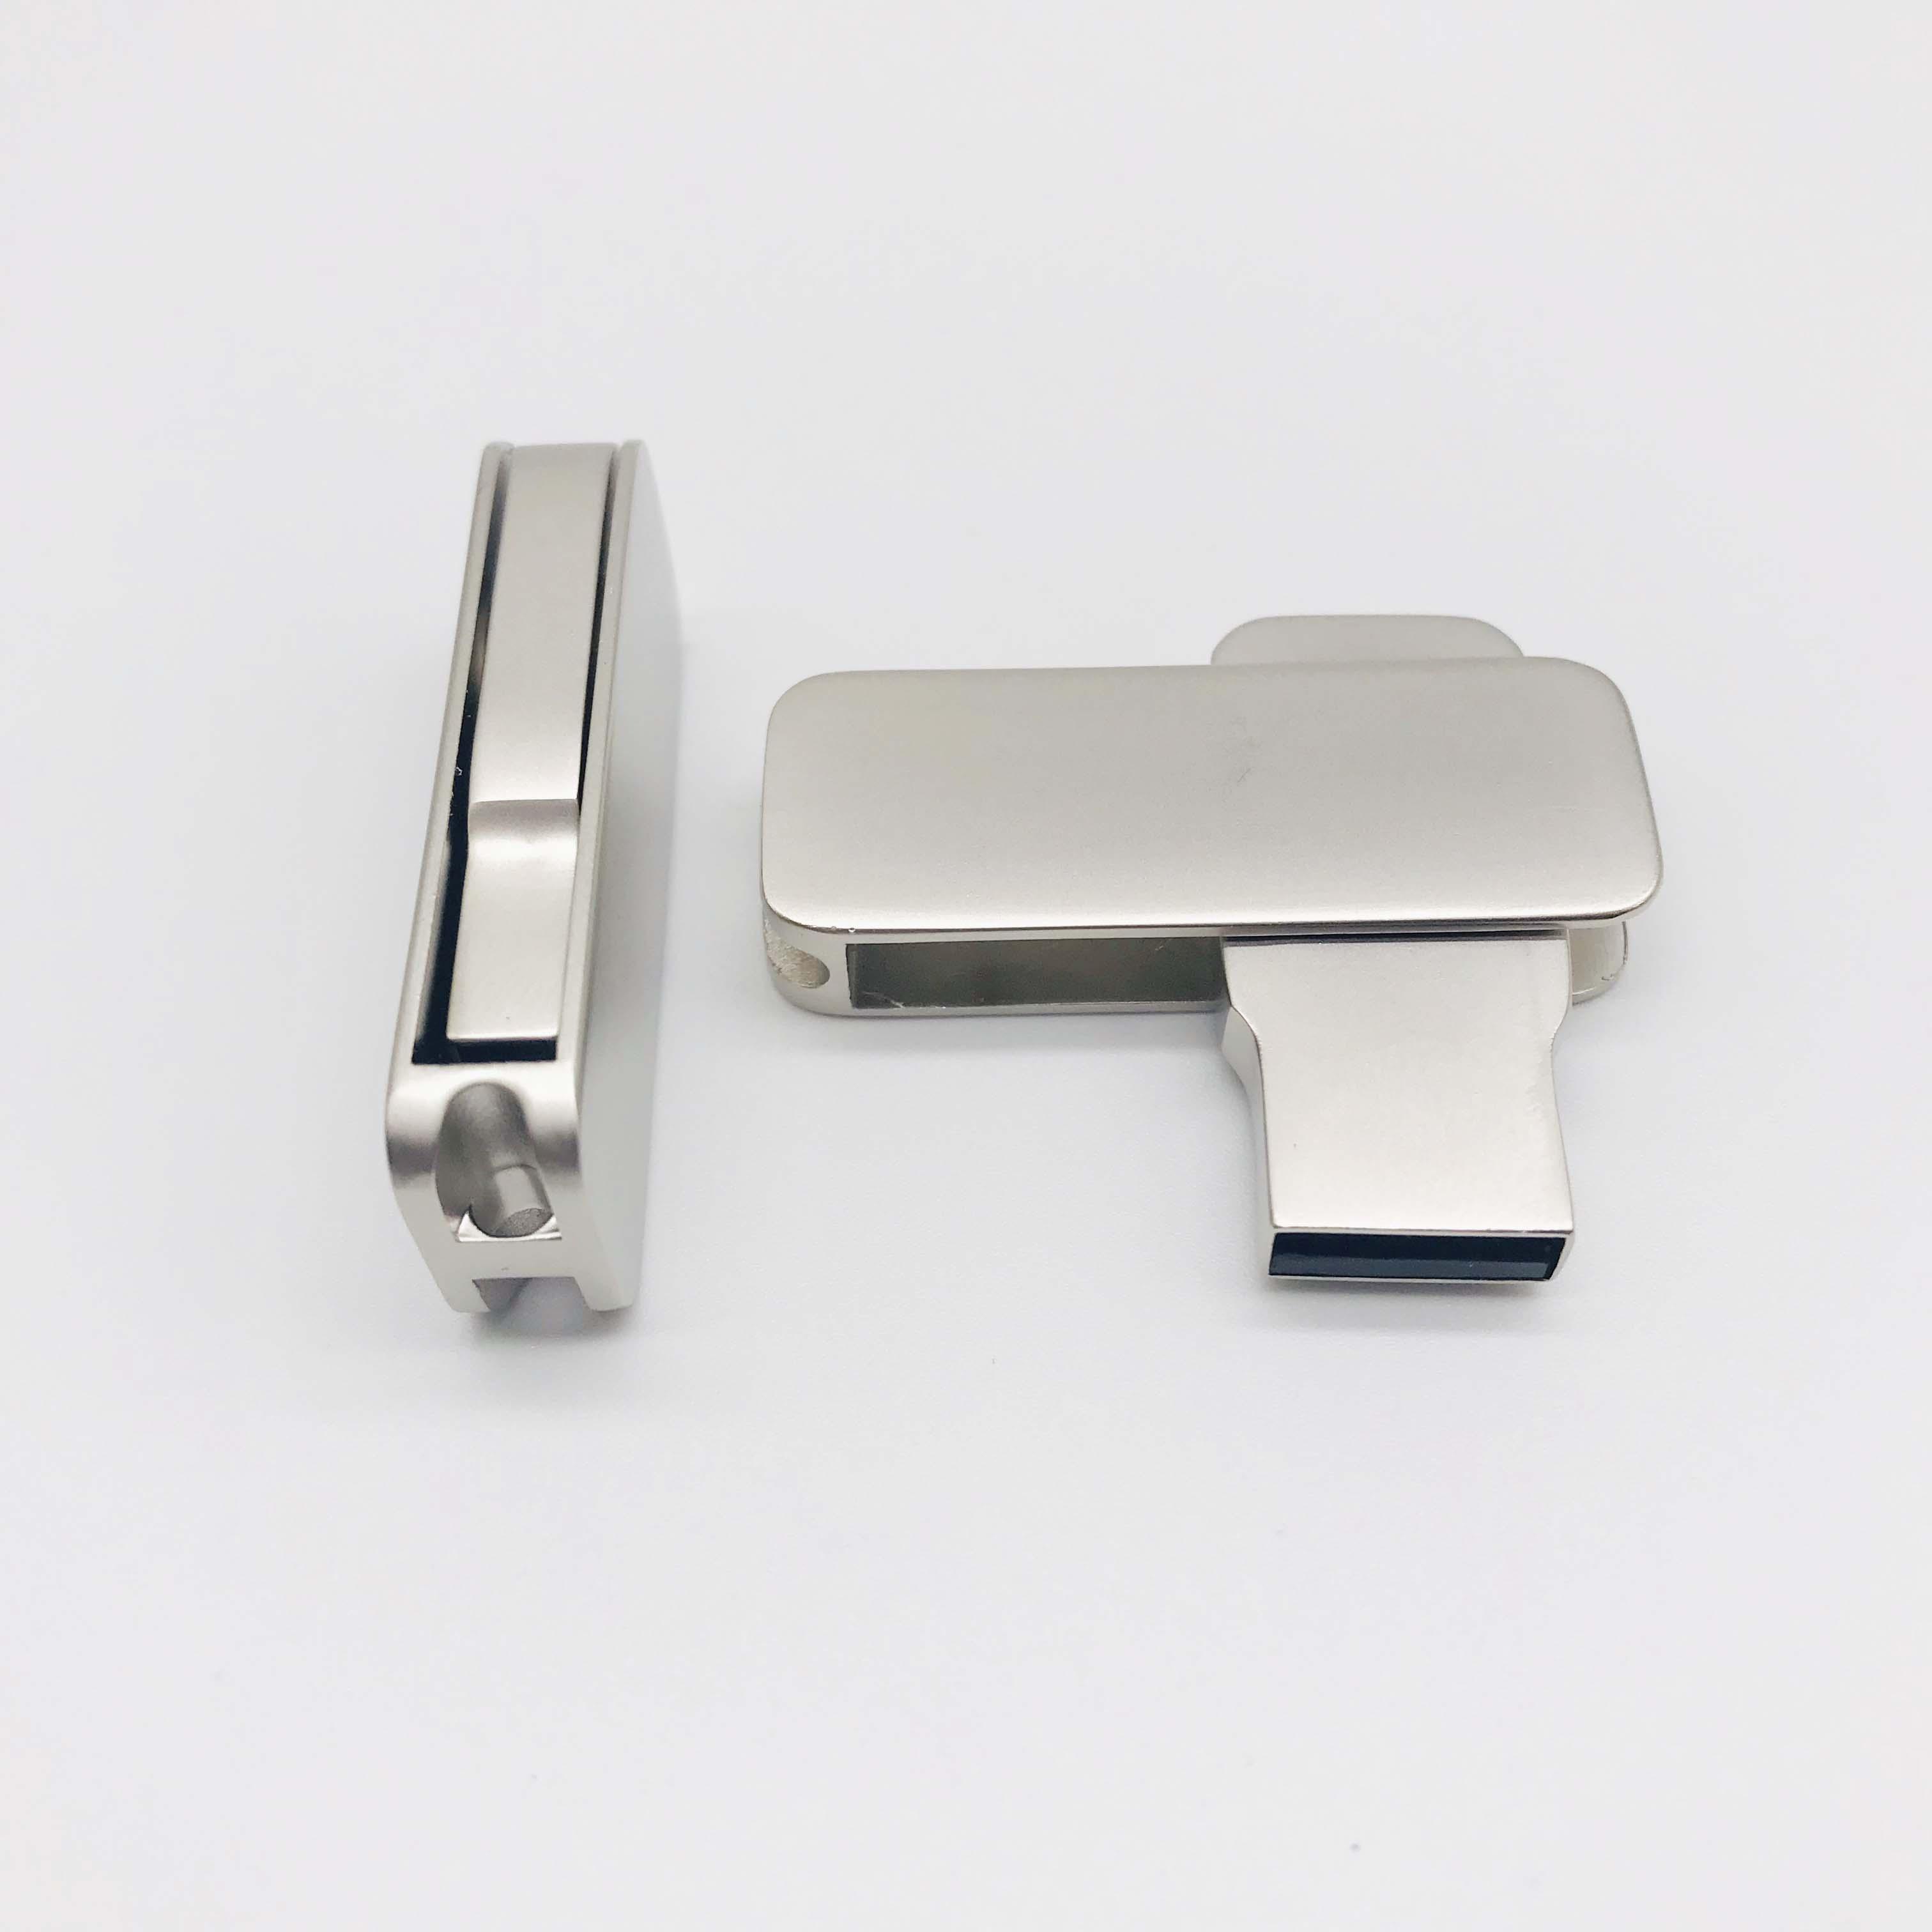 64GB Metal Memorias Pendrive 16GB 32GB Memory Sticks Pen Drive 128GB Custom Logo USB Stick - USBSKY | USBSKY.NET